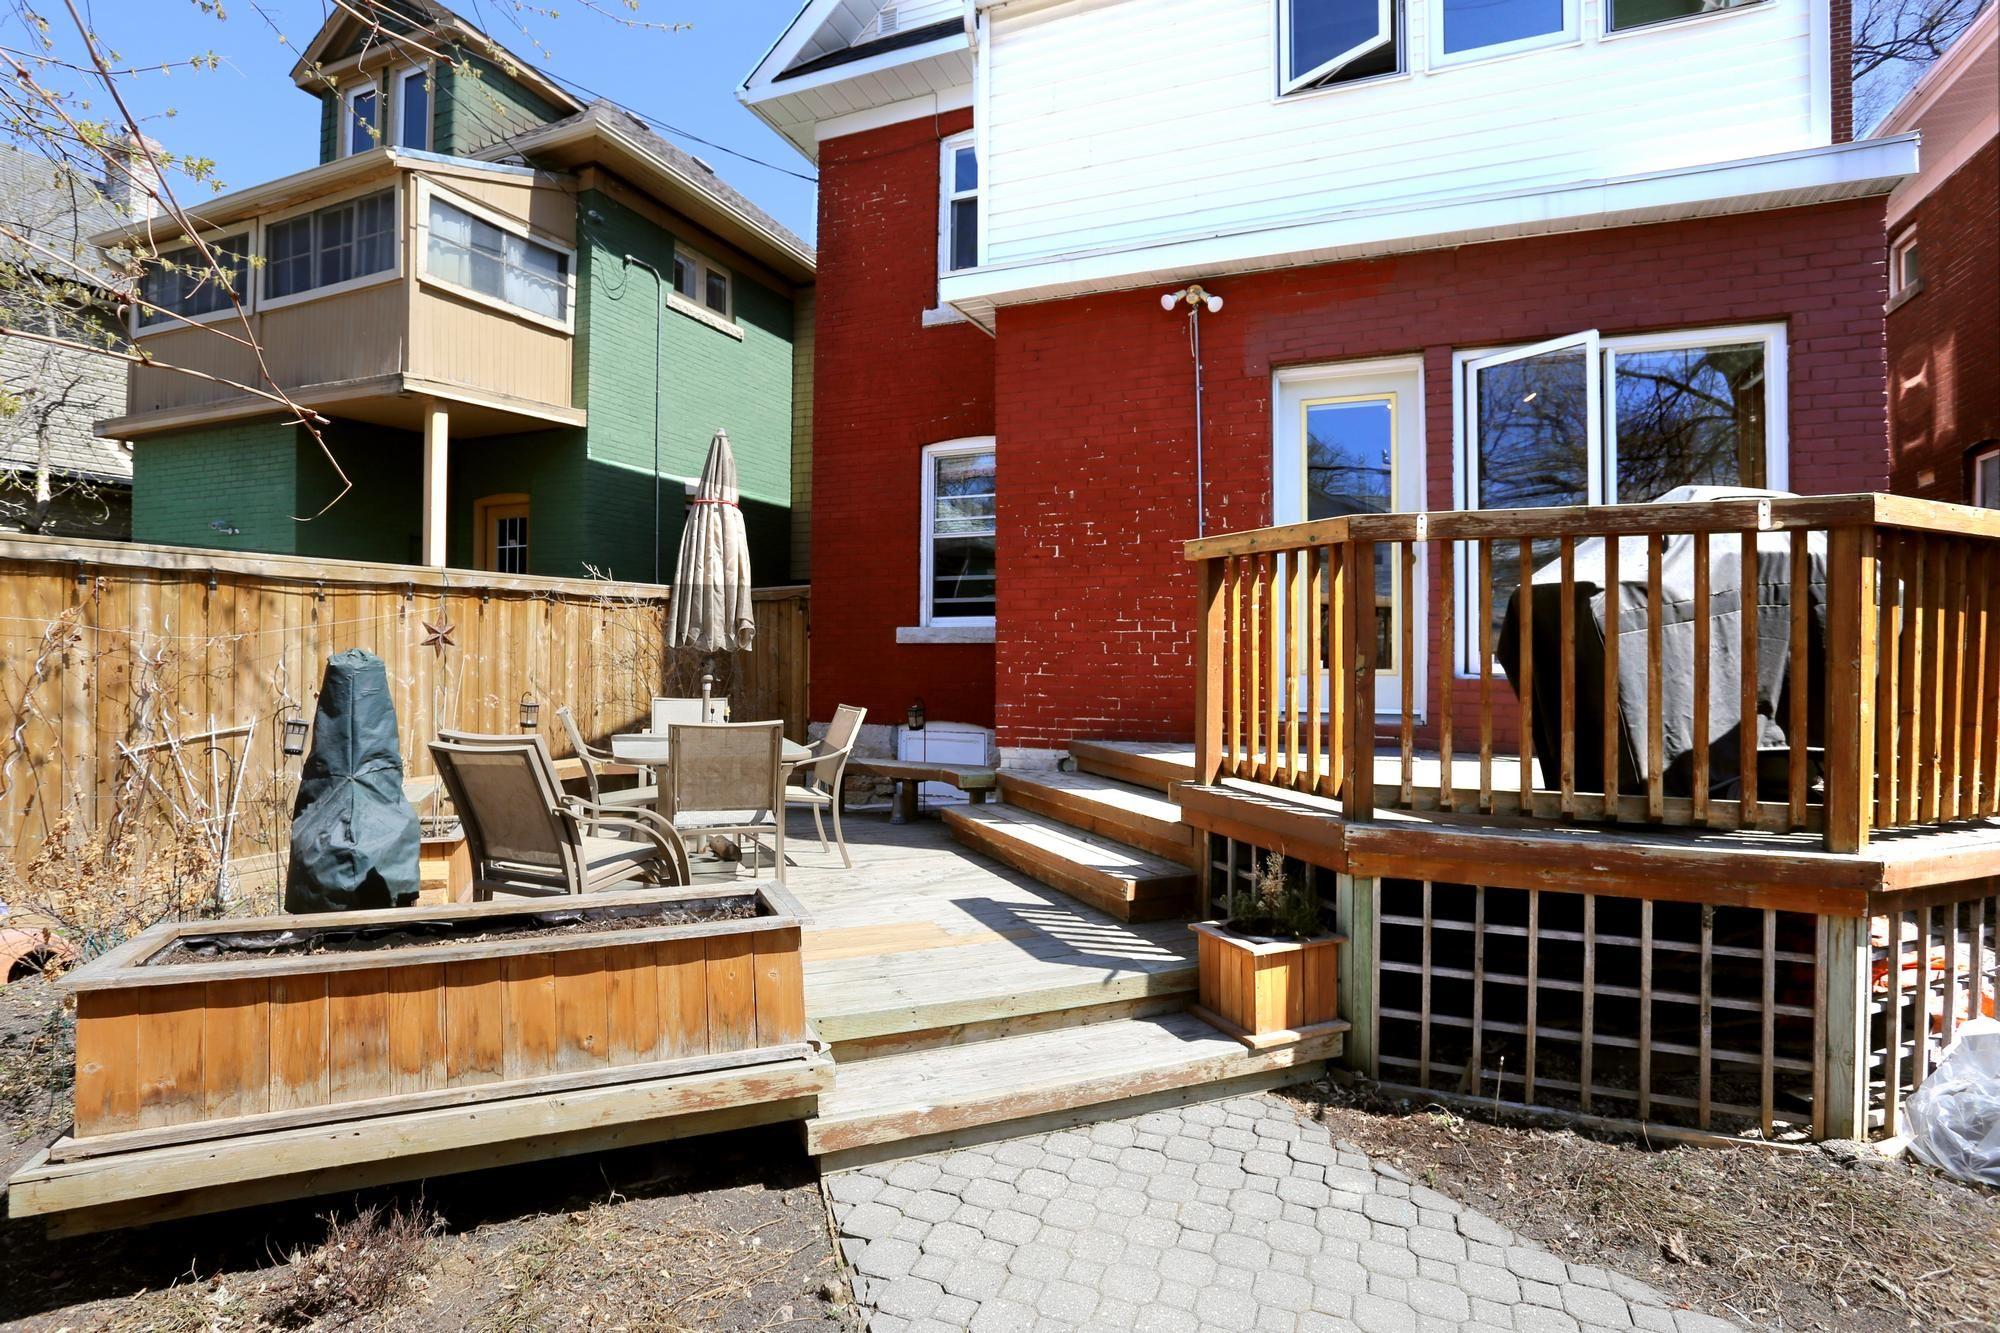 Photo 32: Photos: 96 Home Street in Winnipeg: Wolseley Single Family Detached for sale (5B)  : MLS®# 1810985